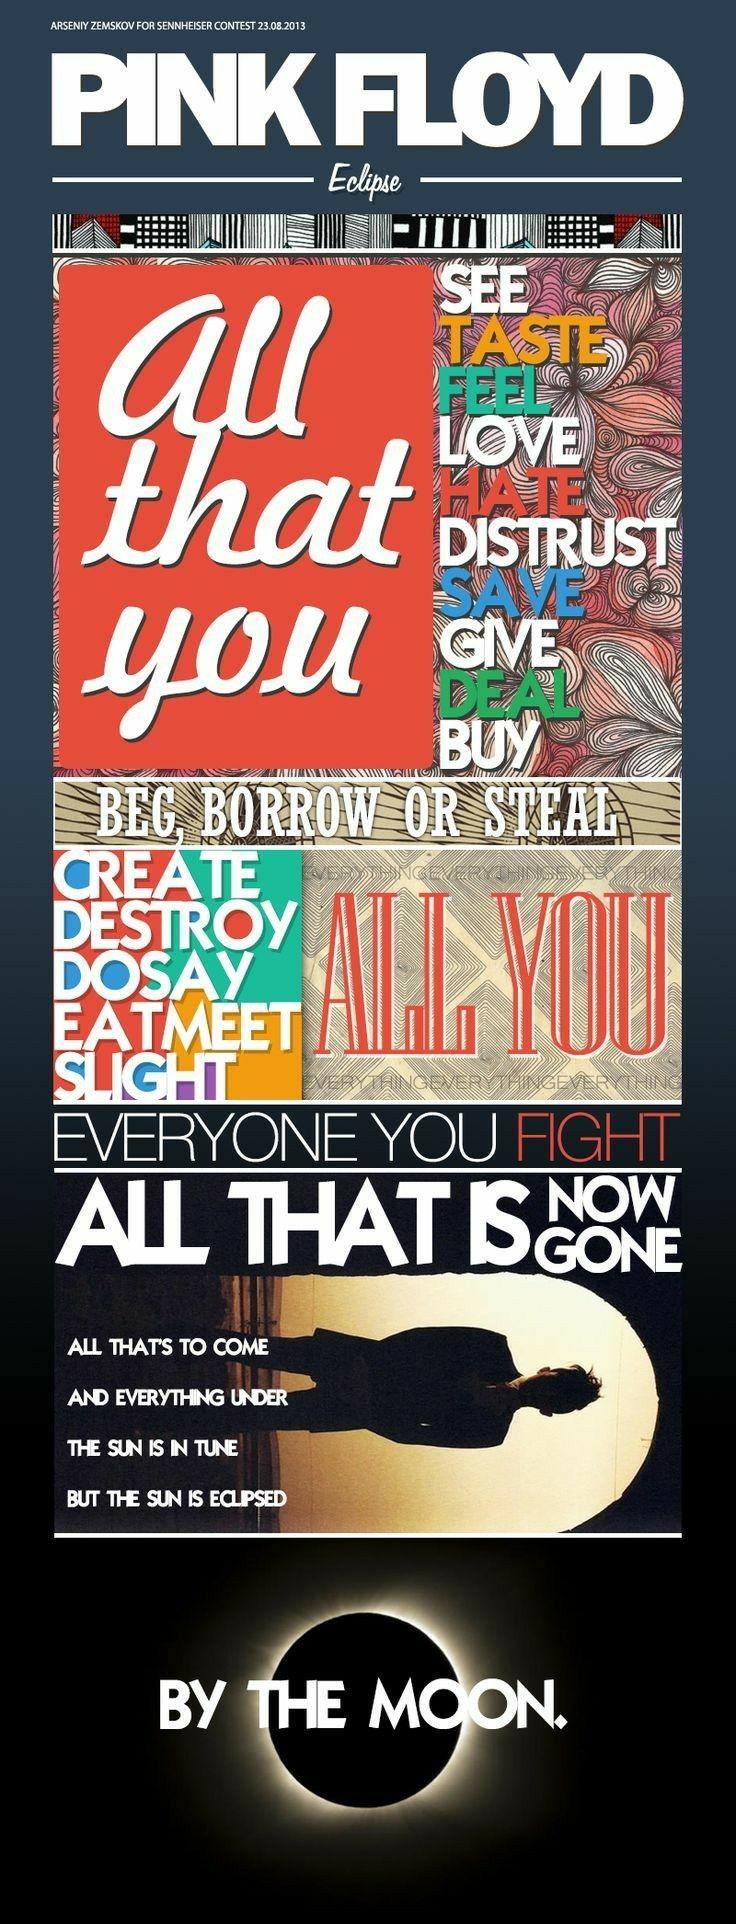 Pin by Lito Mazzetti on ! Pink Floyd Pink floyd lyrics